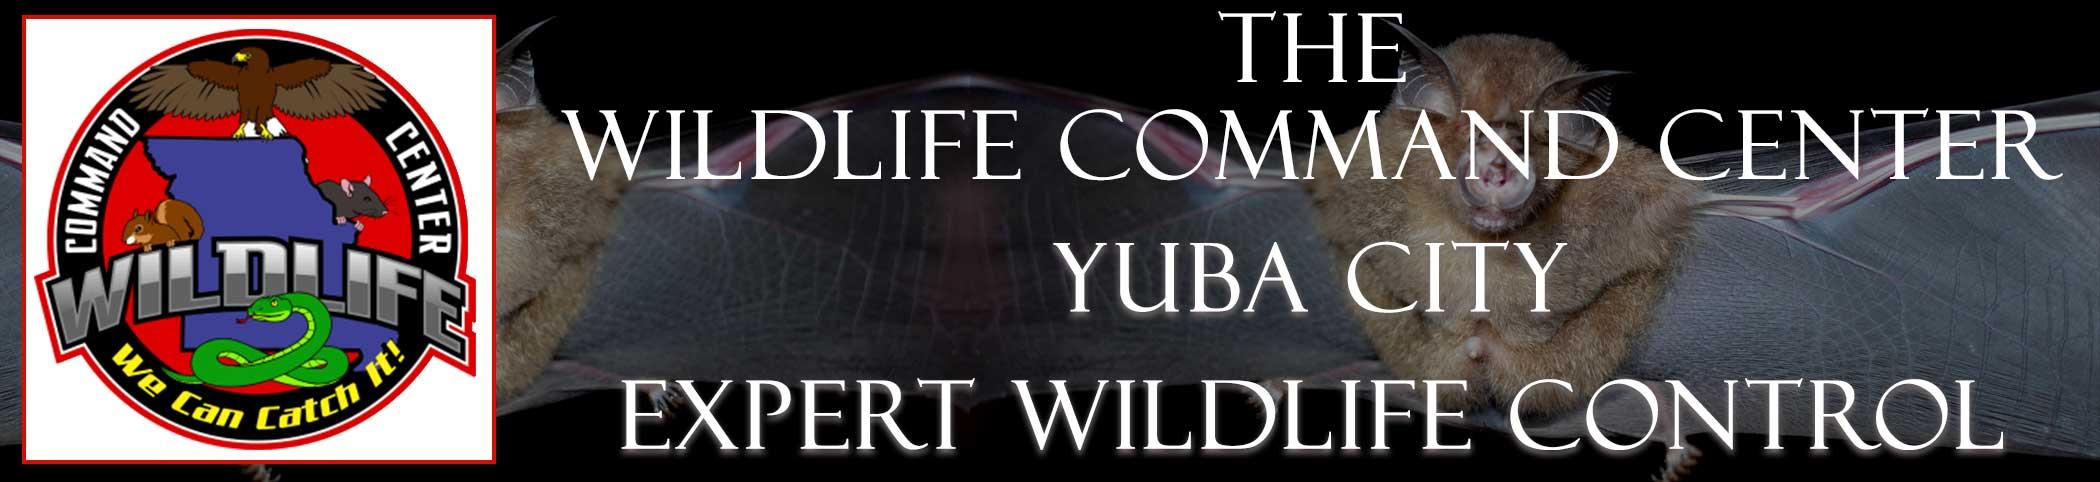 yuba-city-wildlife-command-center